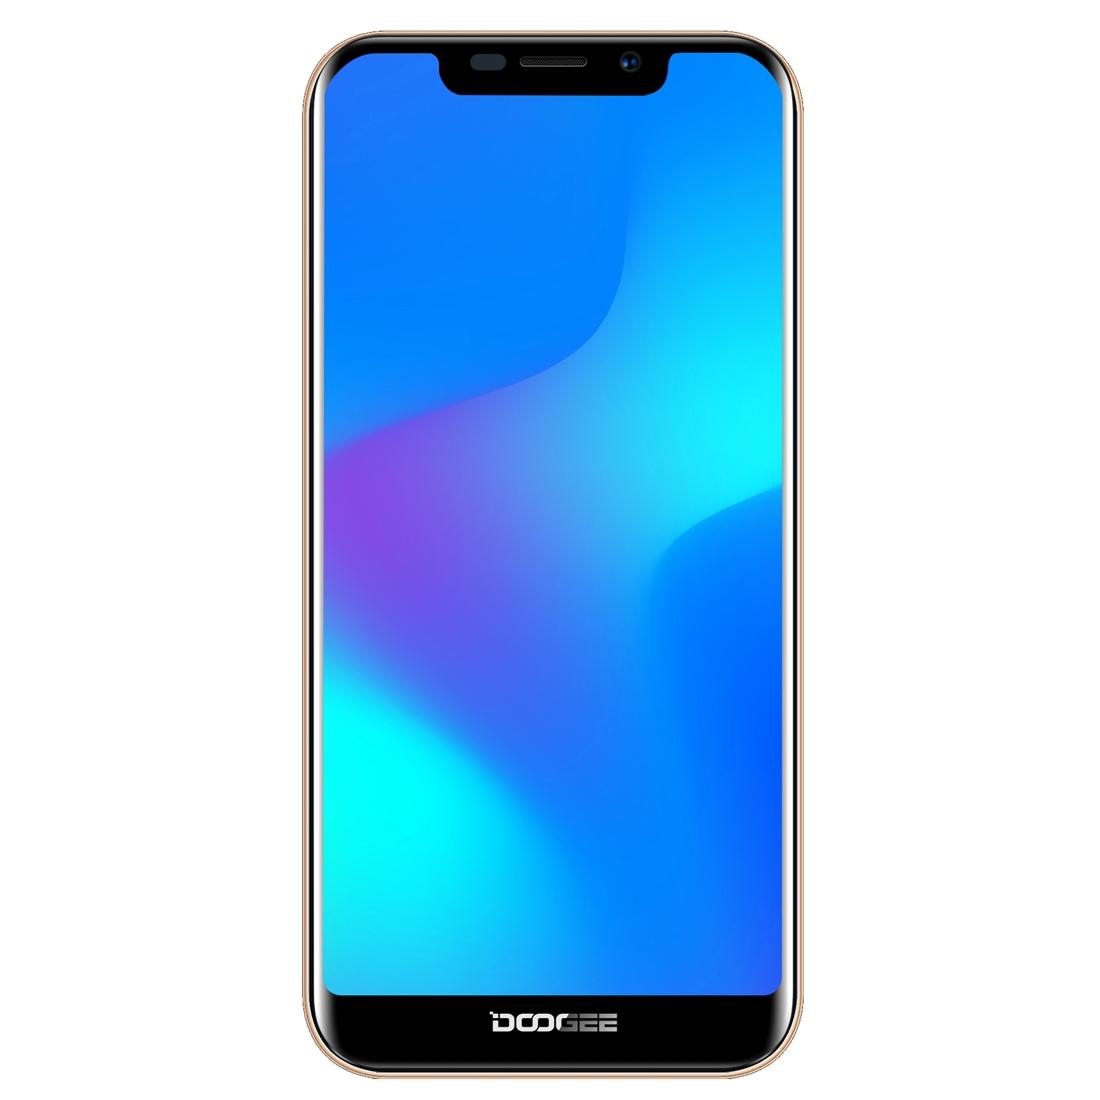 Смартфон DOOGEE X70 MTK6580 4 ядра 2GB RAM 16GB Двойная задняя камера 4000мАч